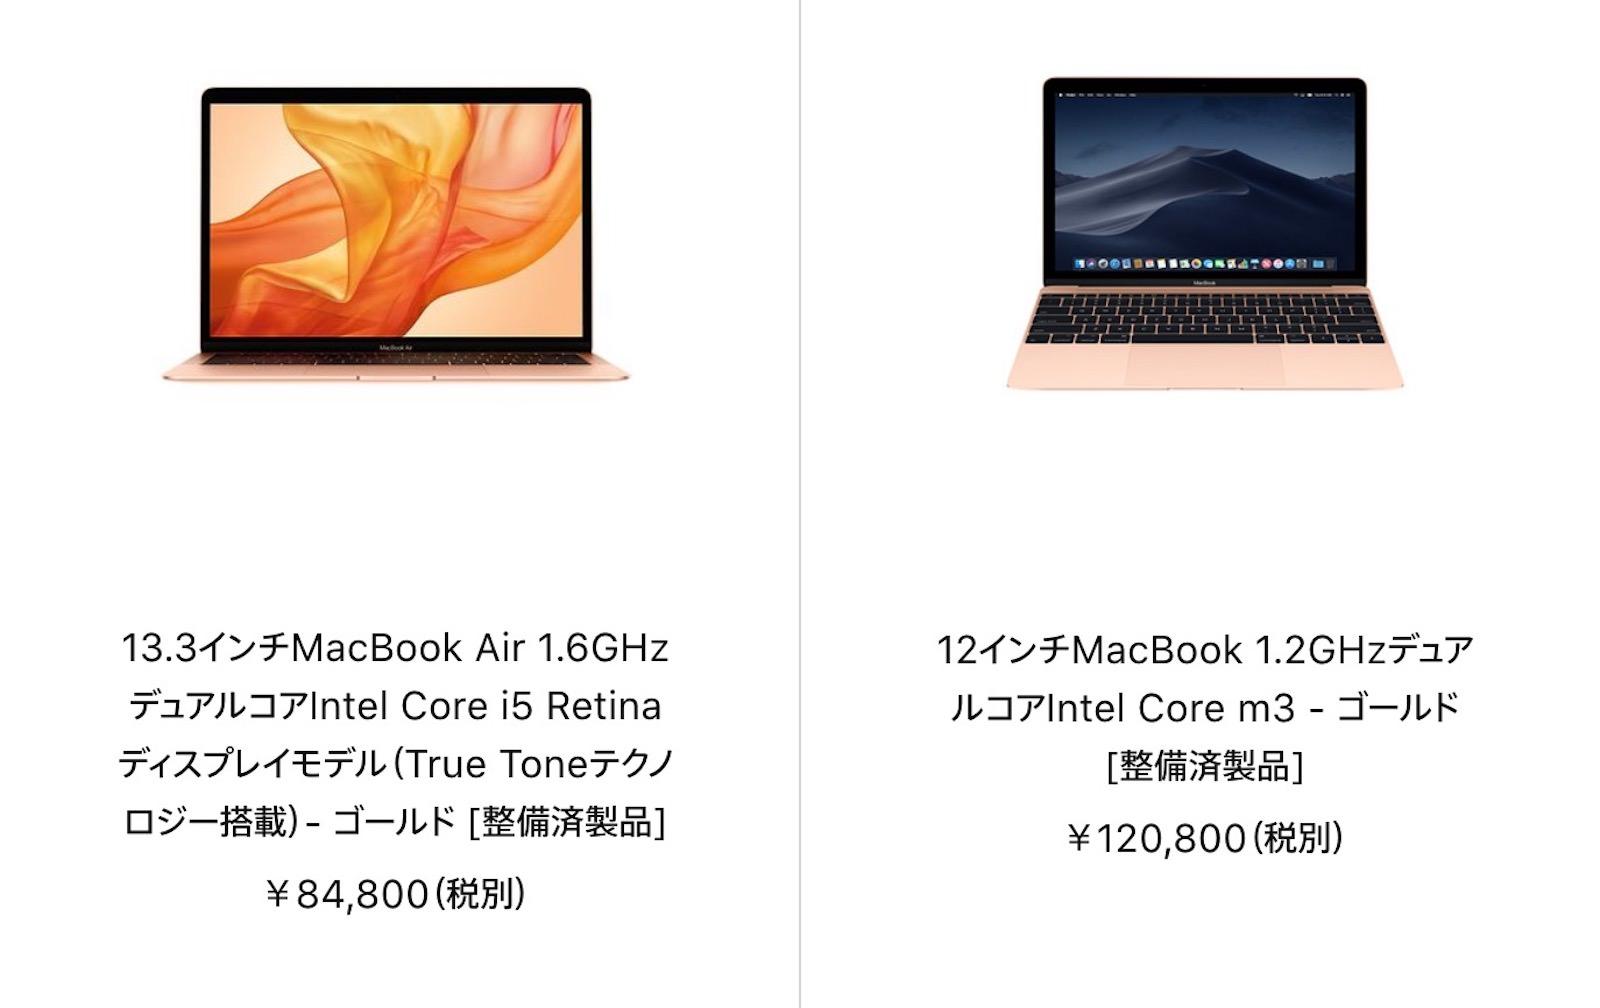 Macbook 12inch and macbookair refurbished